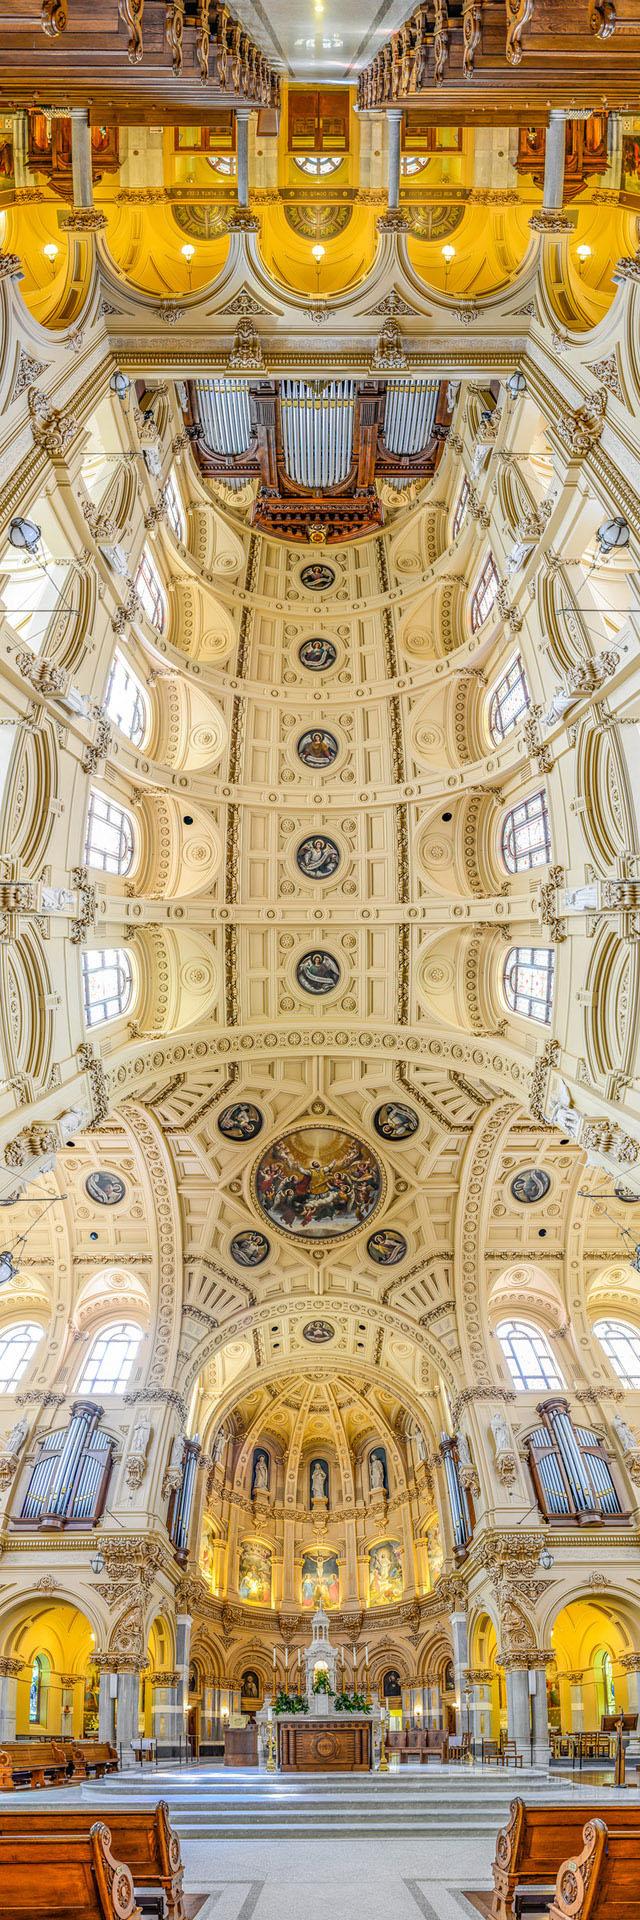 вертикальная панорама церкви